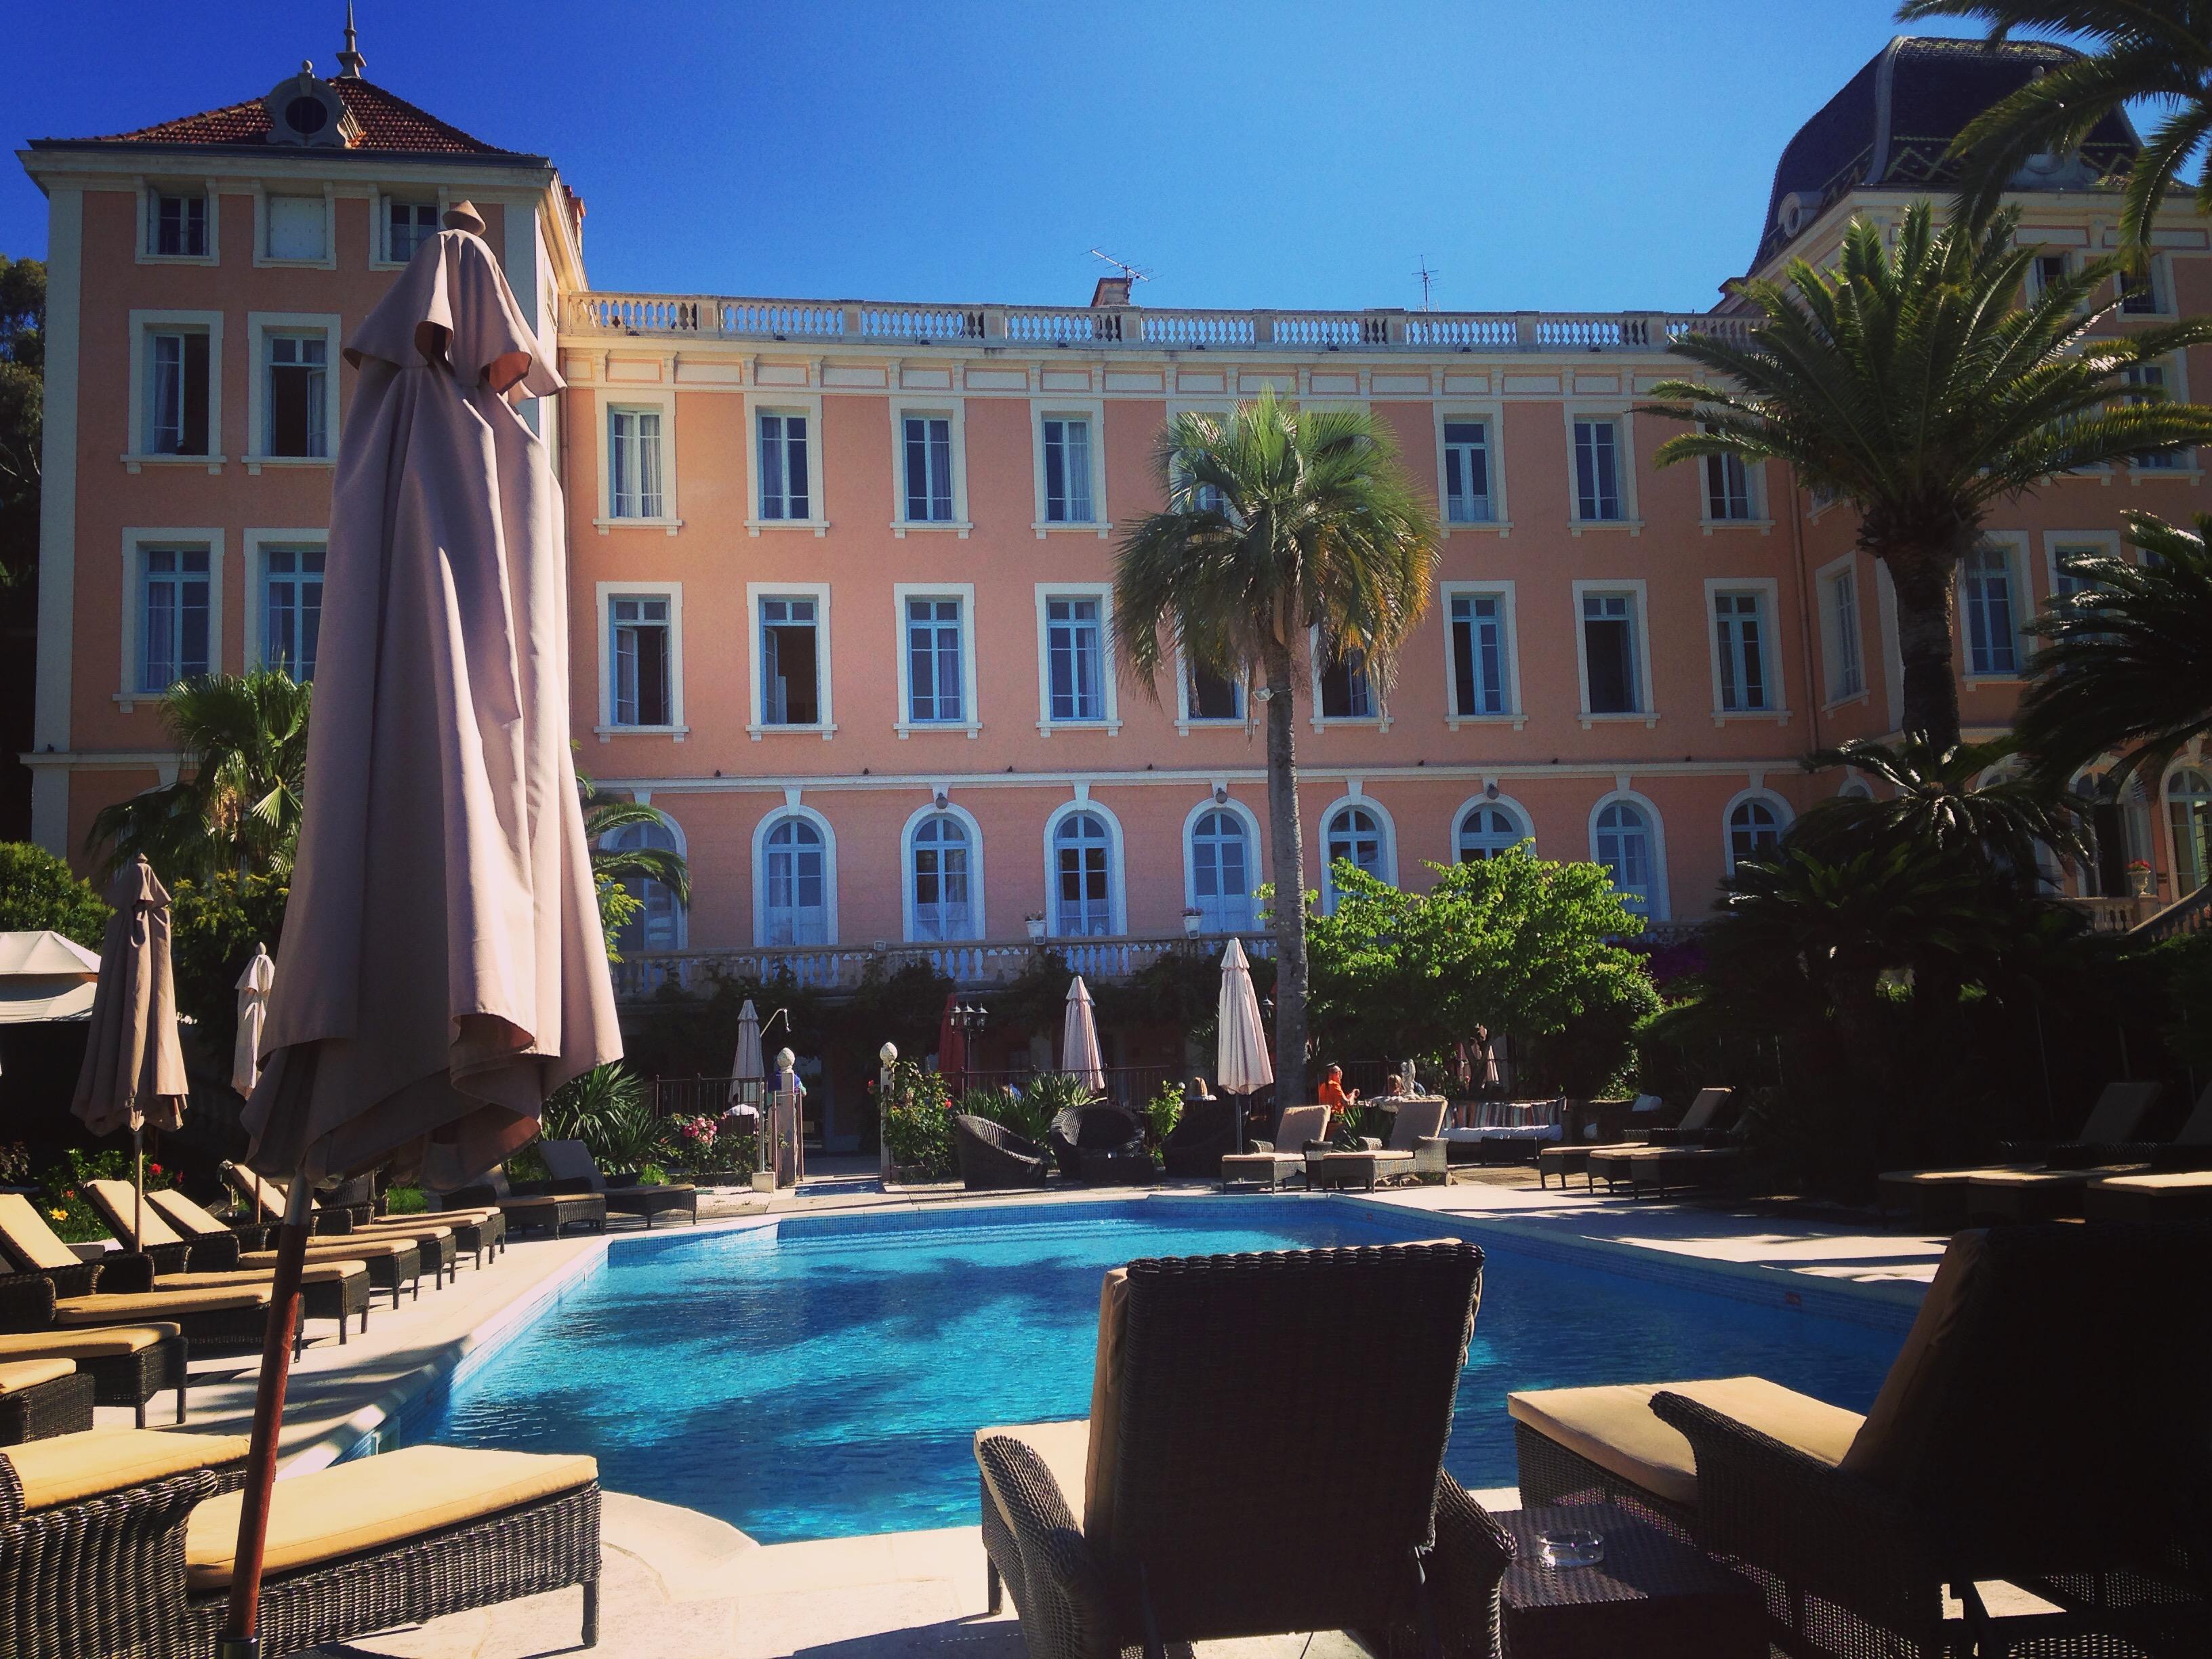 La croix valmer hotel l'orangeraie piscine var france